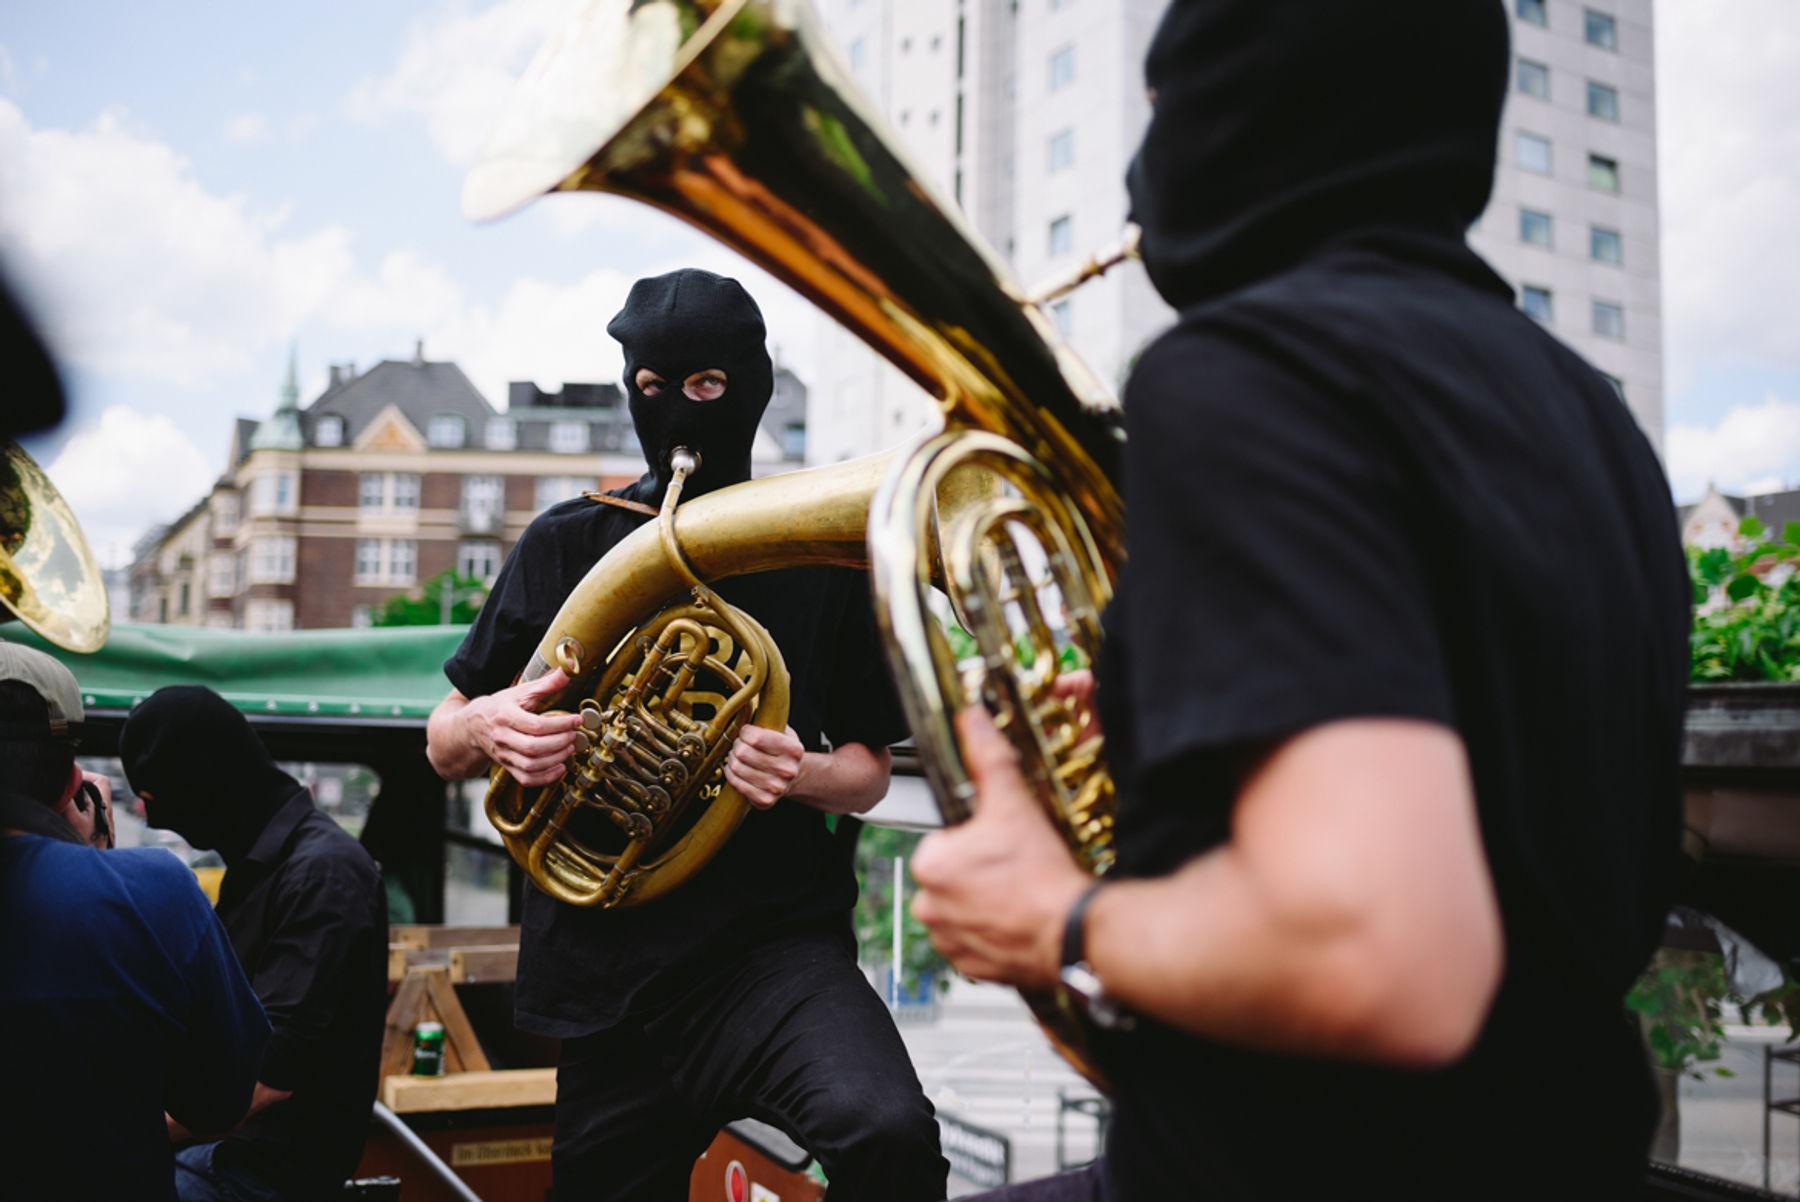 _IHC5525e-Nike-SB-Copenhagen-Open-Day-4-July-2015-Photographer-Maksim-Kalanep